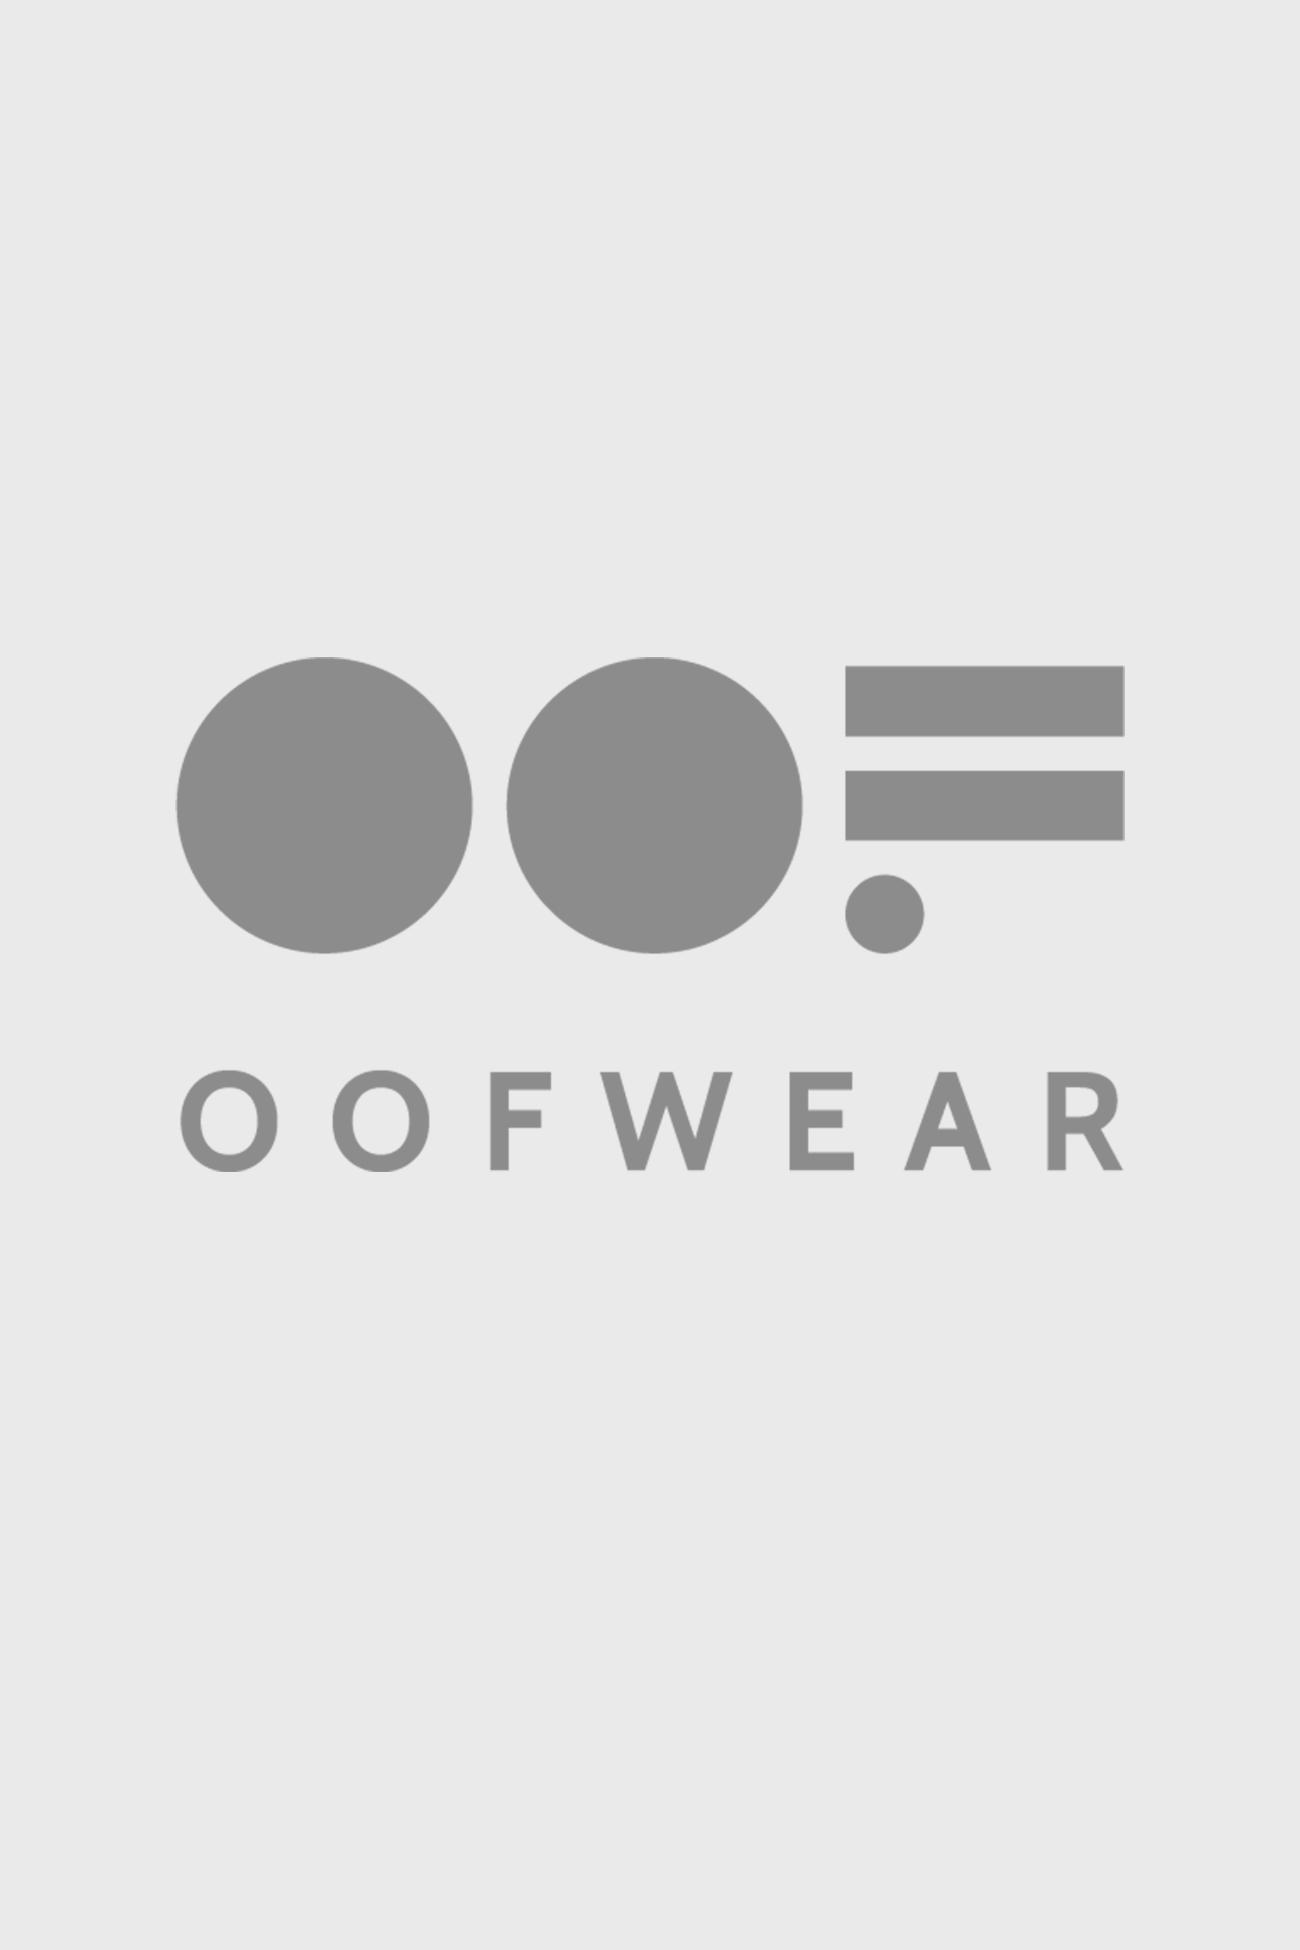 T-shirt 7001 in shiny fabric fuchsia